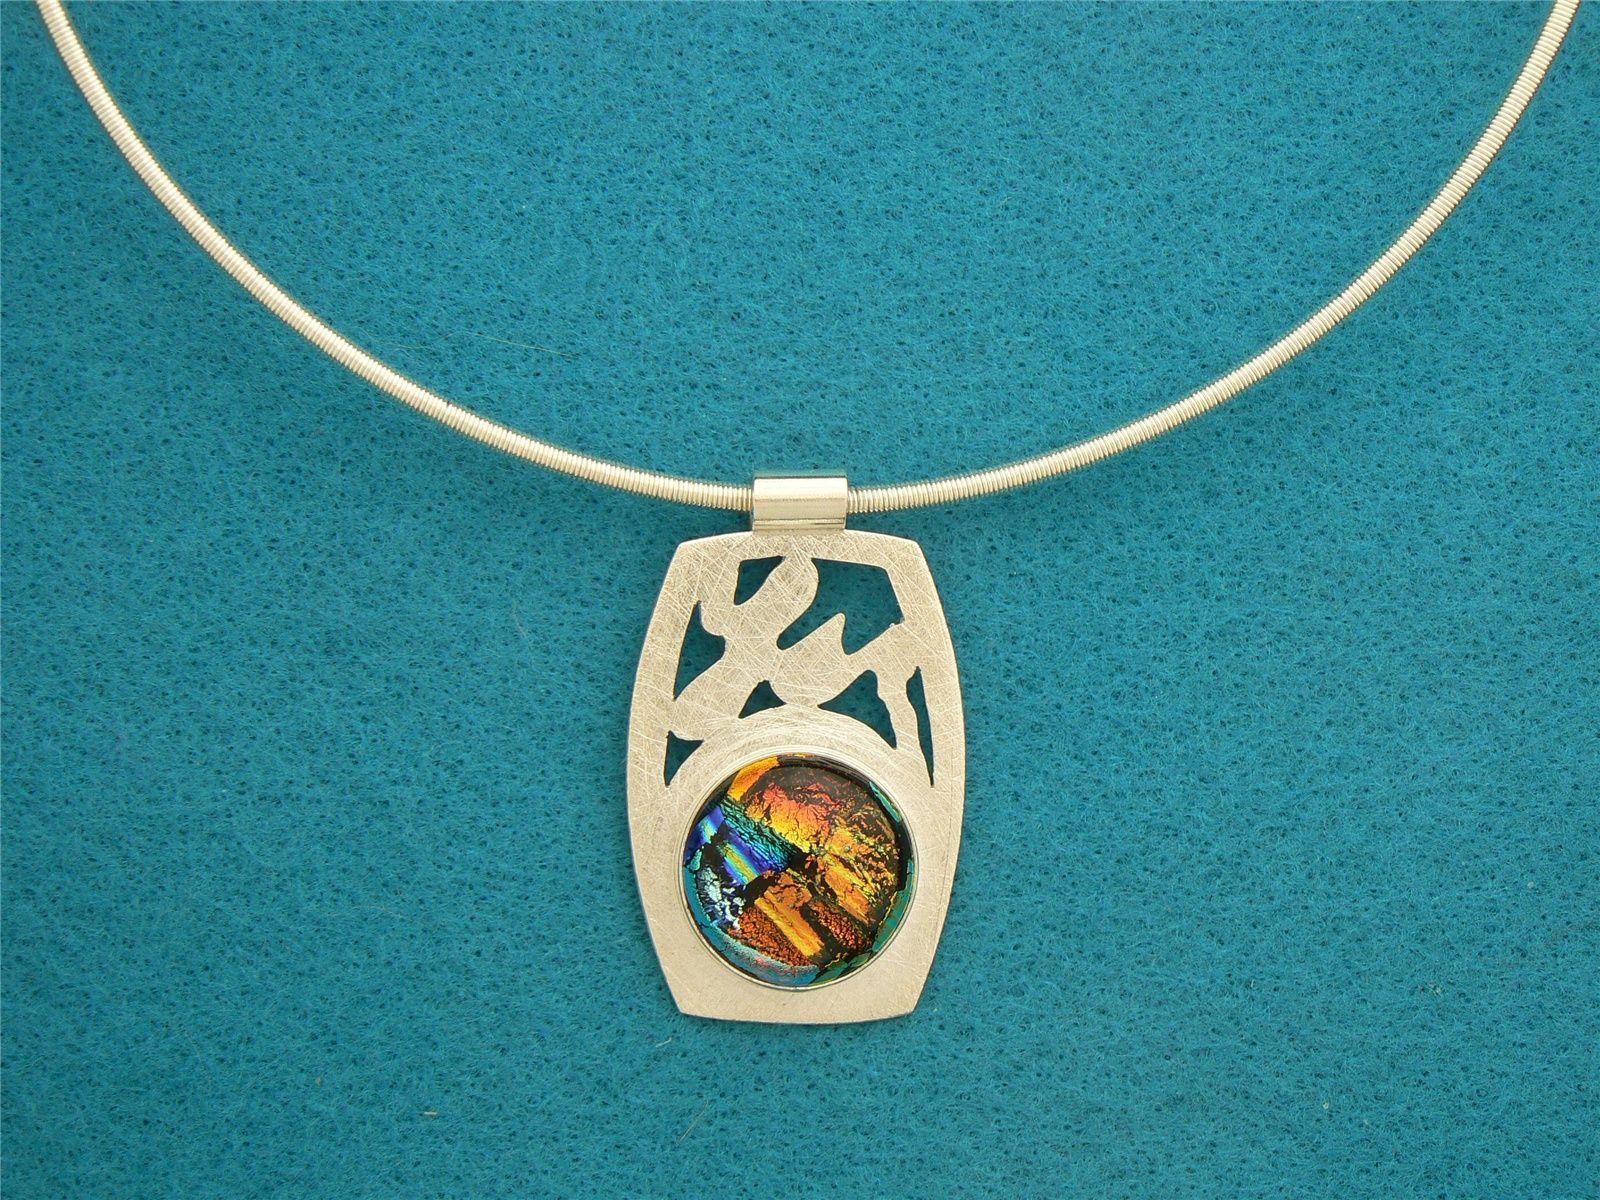 Canyon Secrets - Art Jewelry Magazine - Jewelry Projects and Videos ...